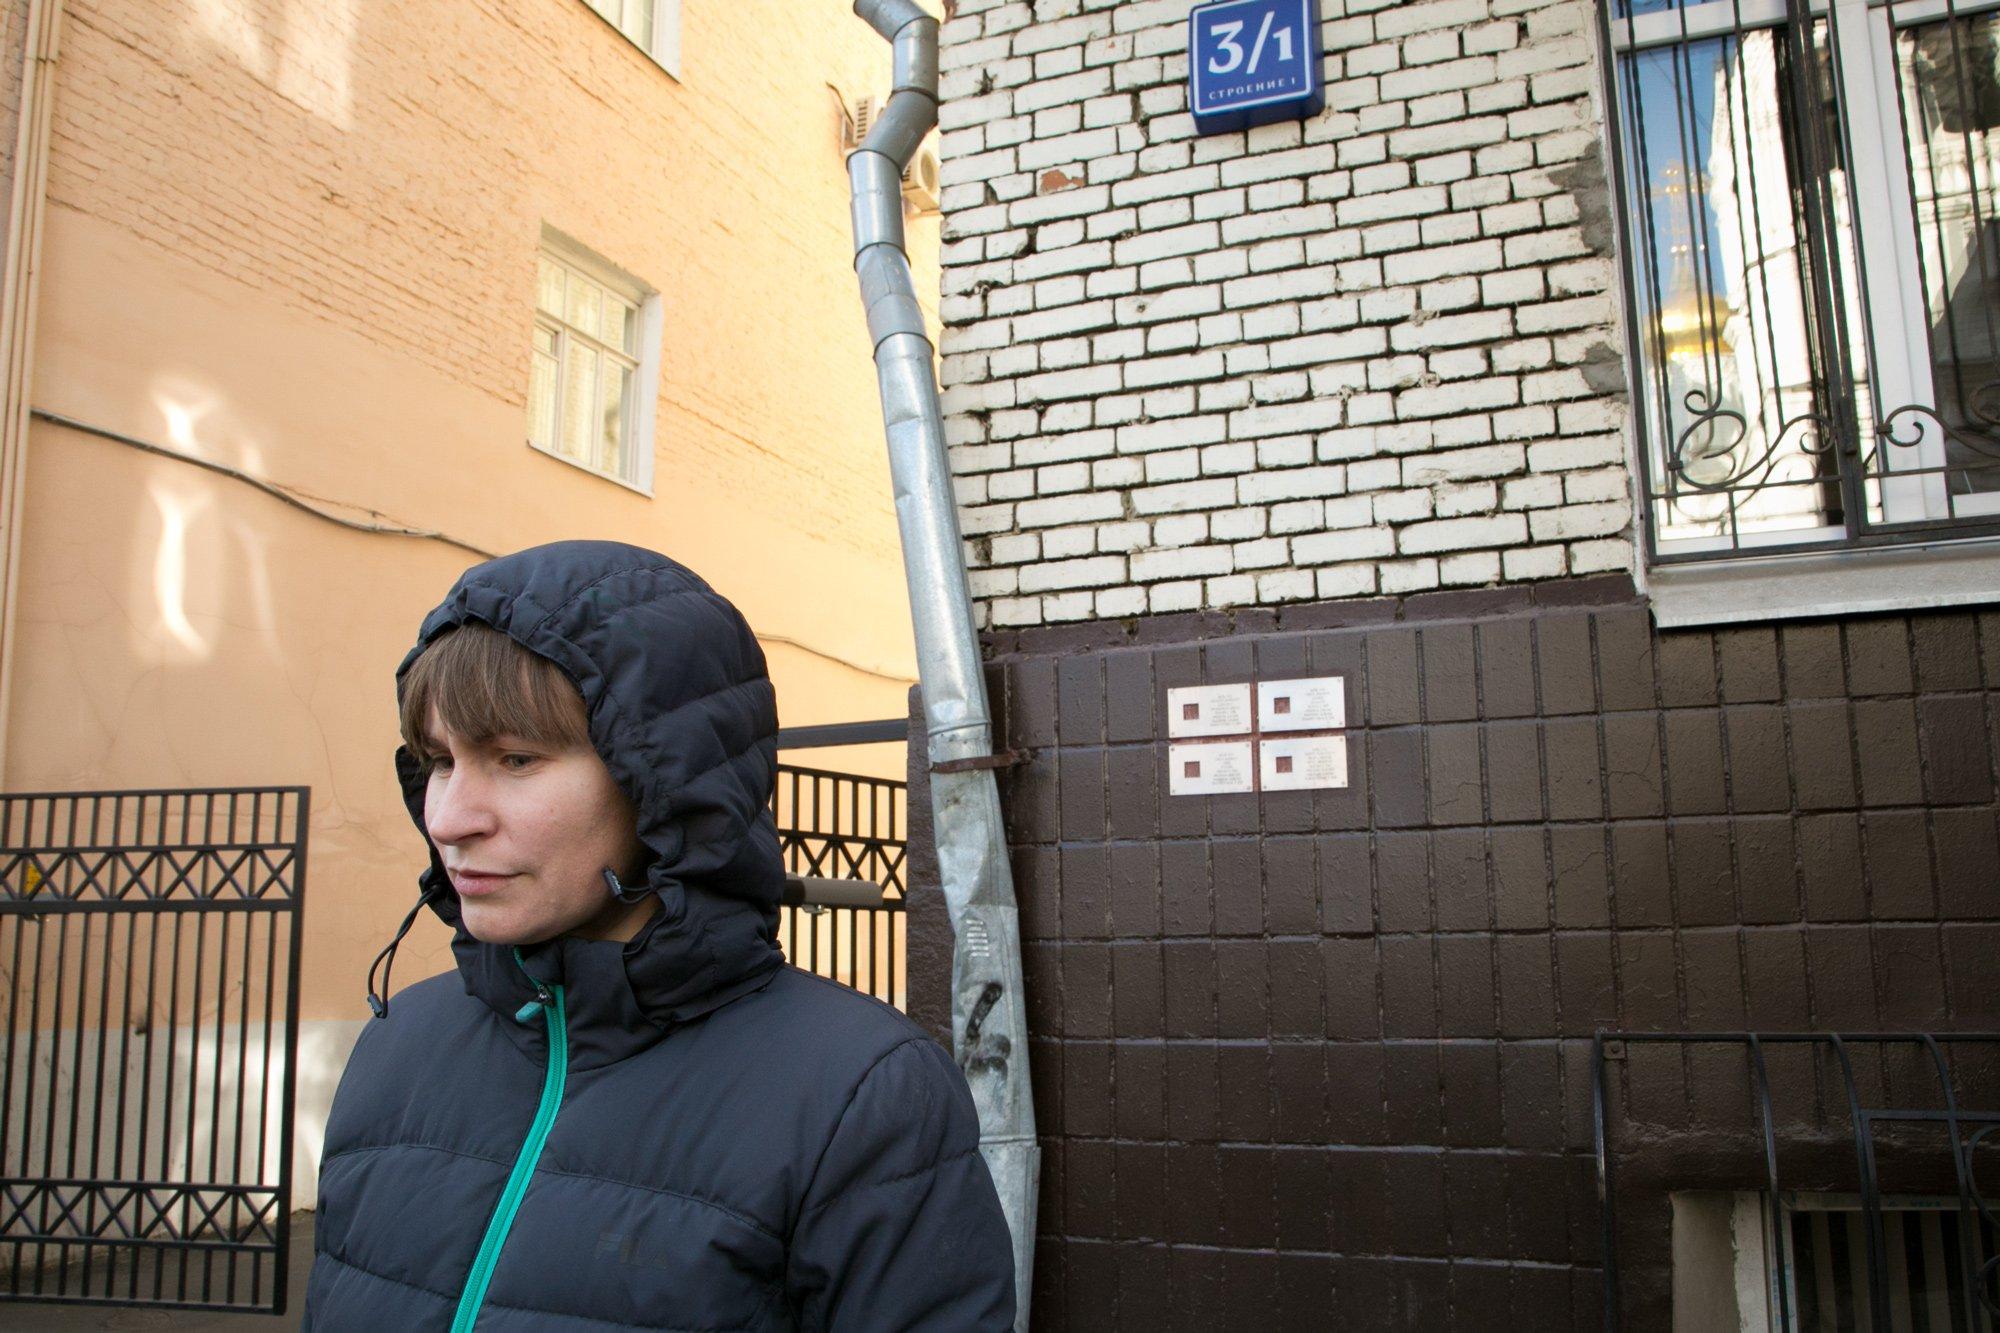 Наталья, служащая Медиапроект s-t-o-l.com